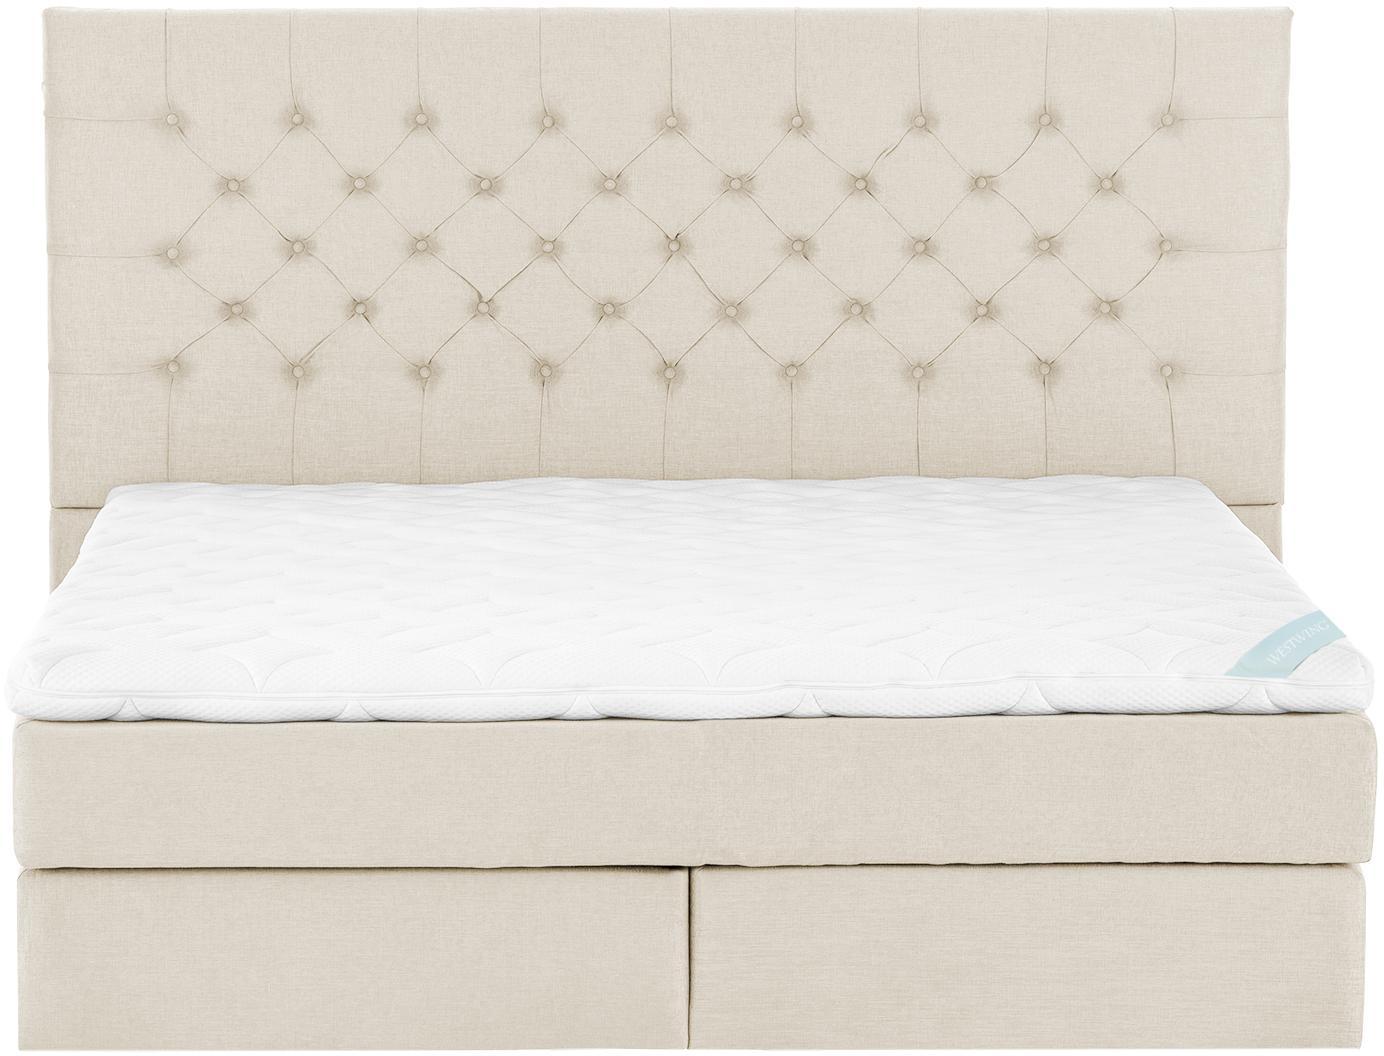 Cama matrimonial Premium Pheobe, Patas: madera de haya maciza pin, Beige, 200 x 200 cm